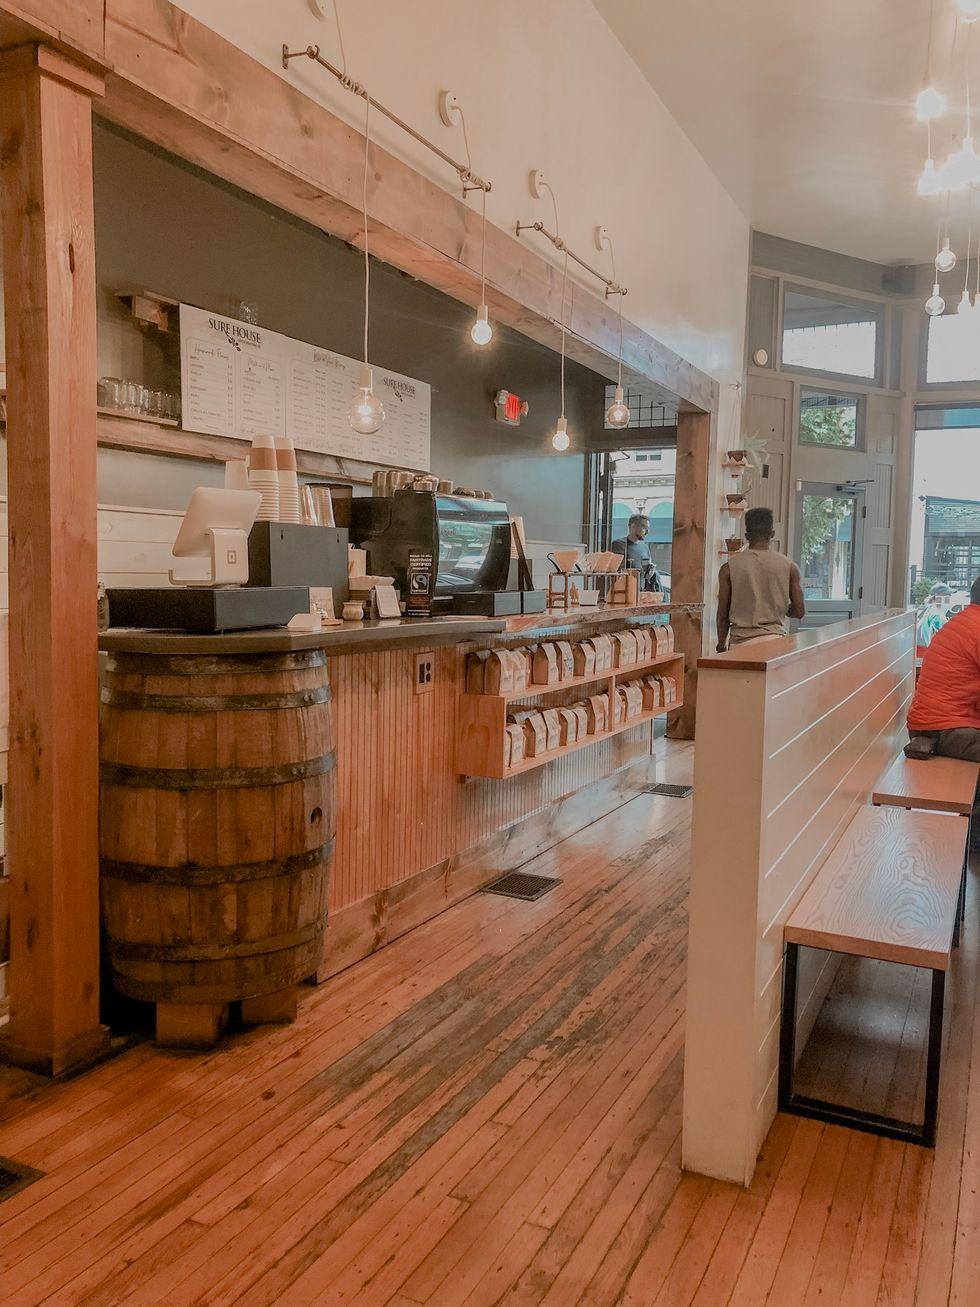 A Coffee Shop Calms My Nerves